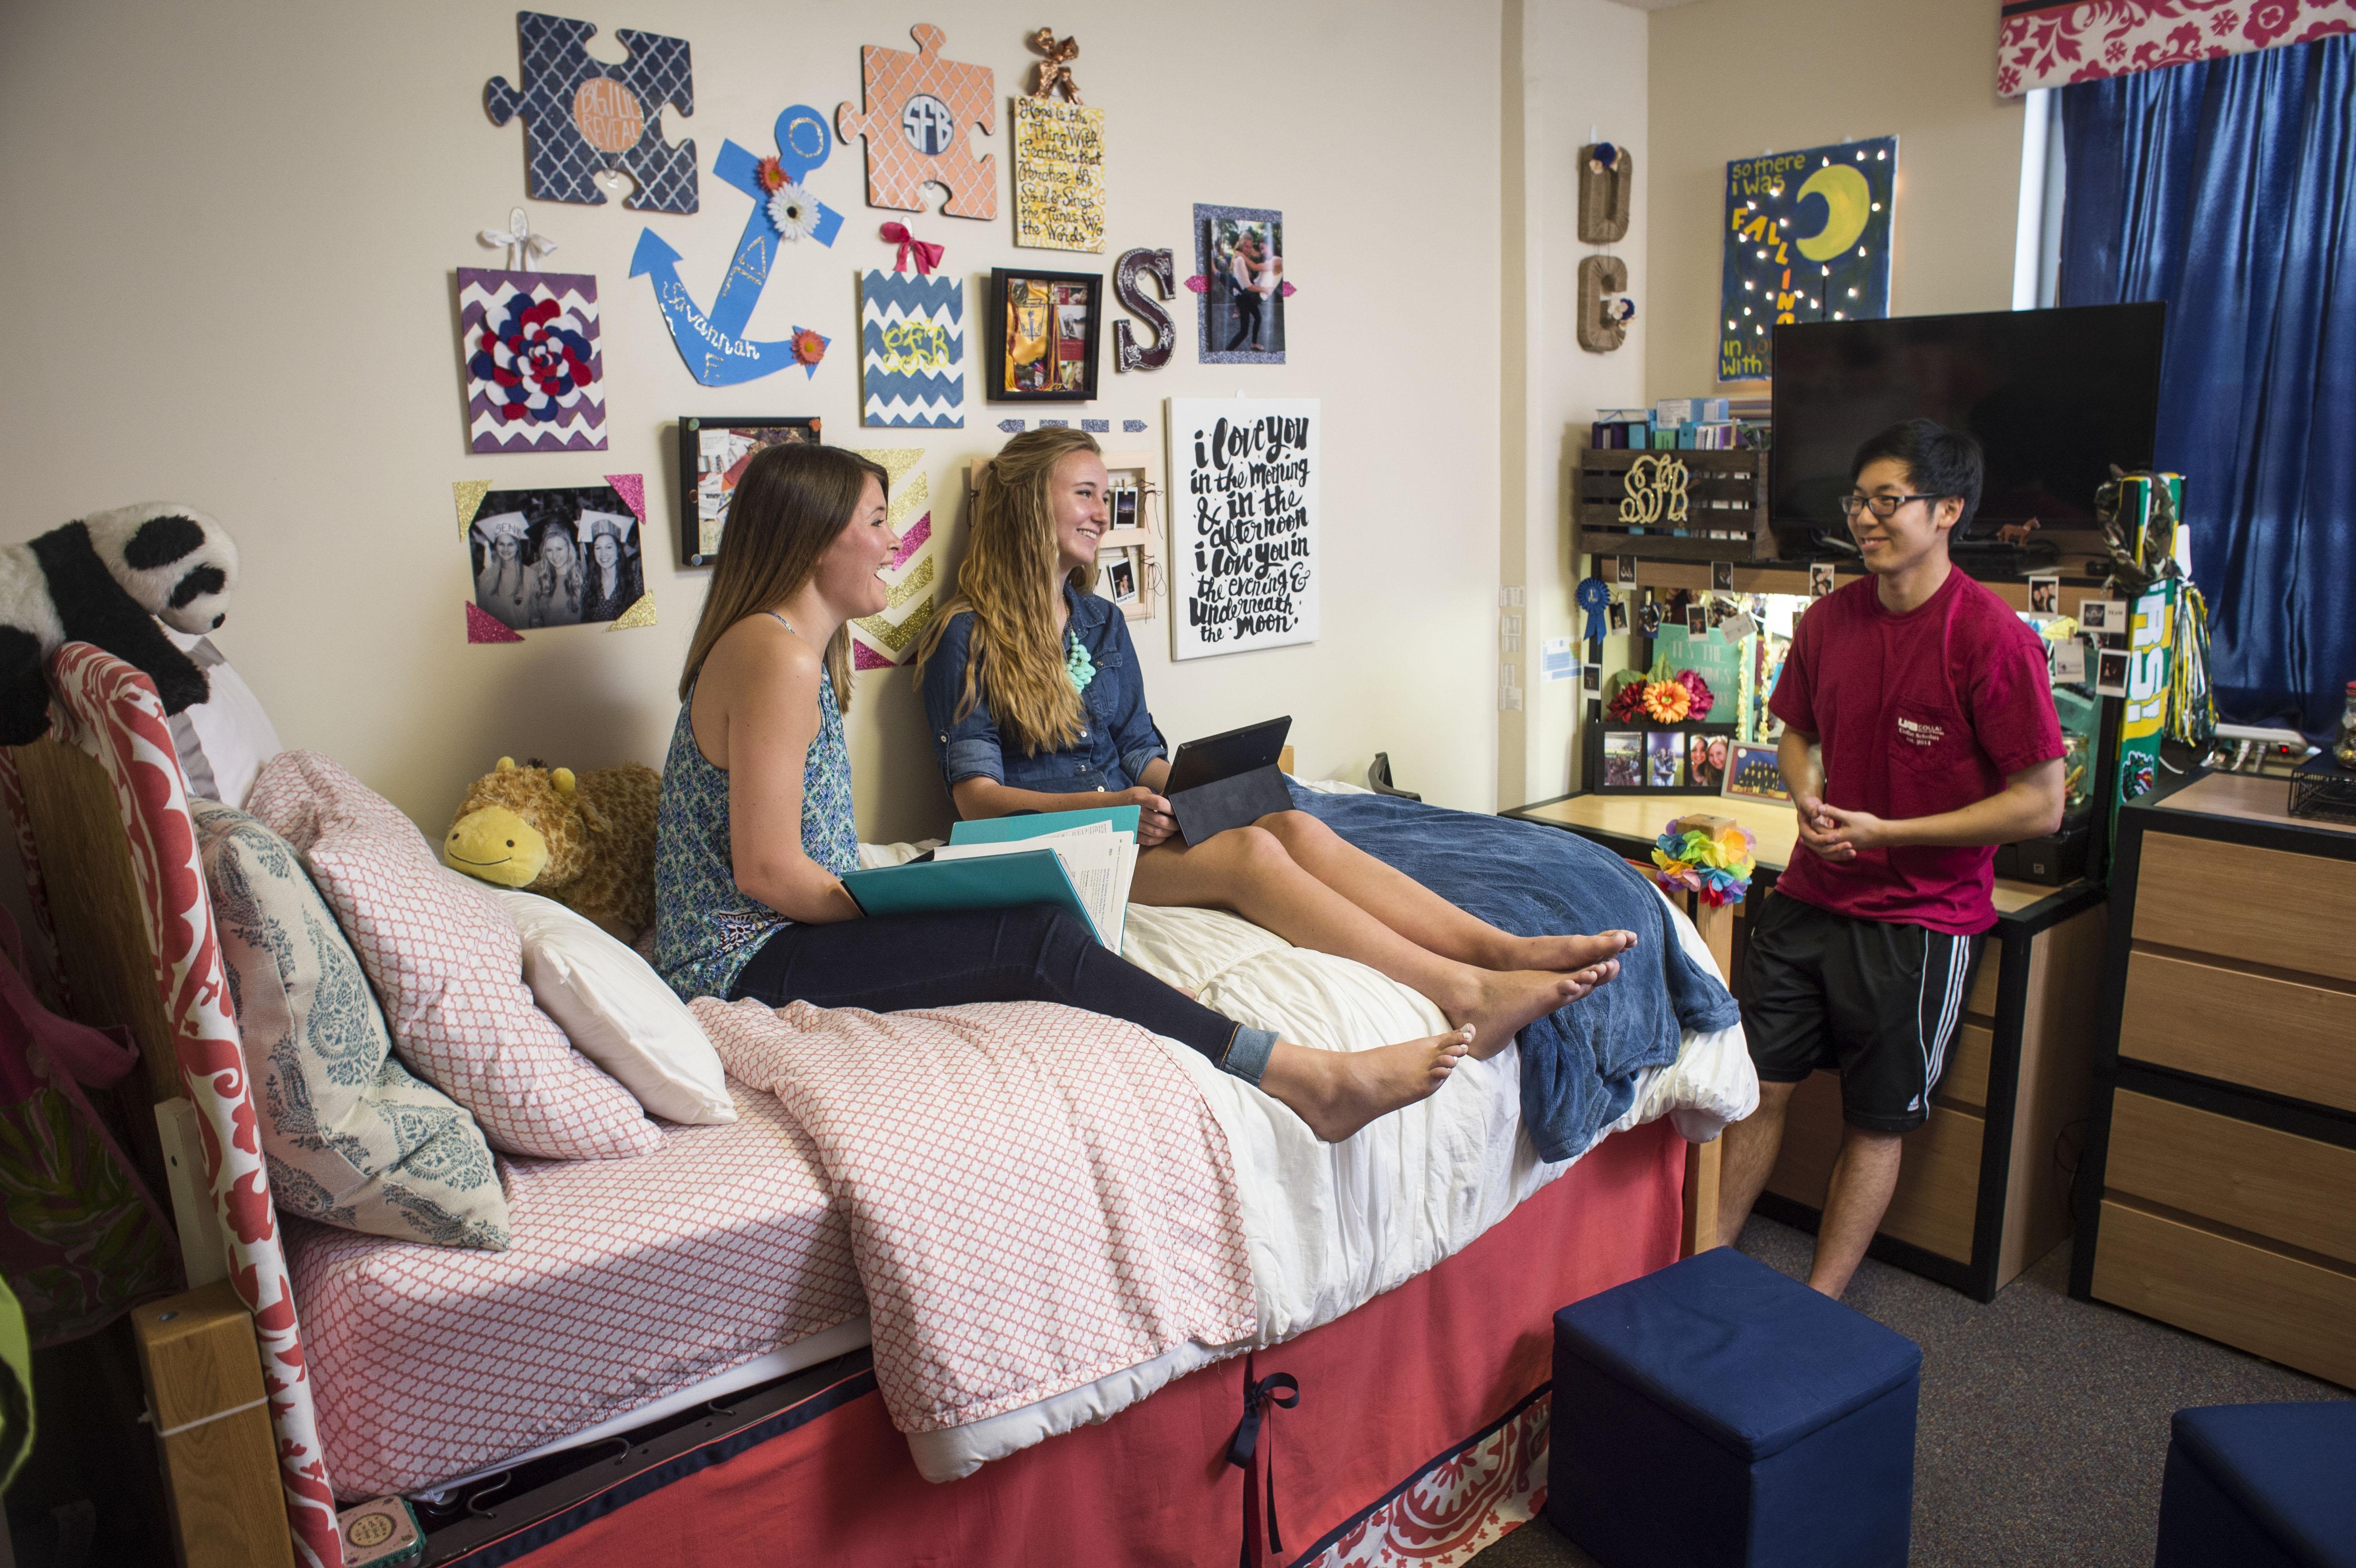 Blazer Hall dorm room @ UAB